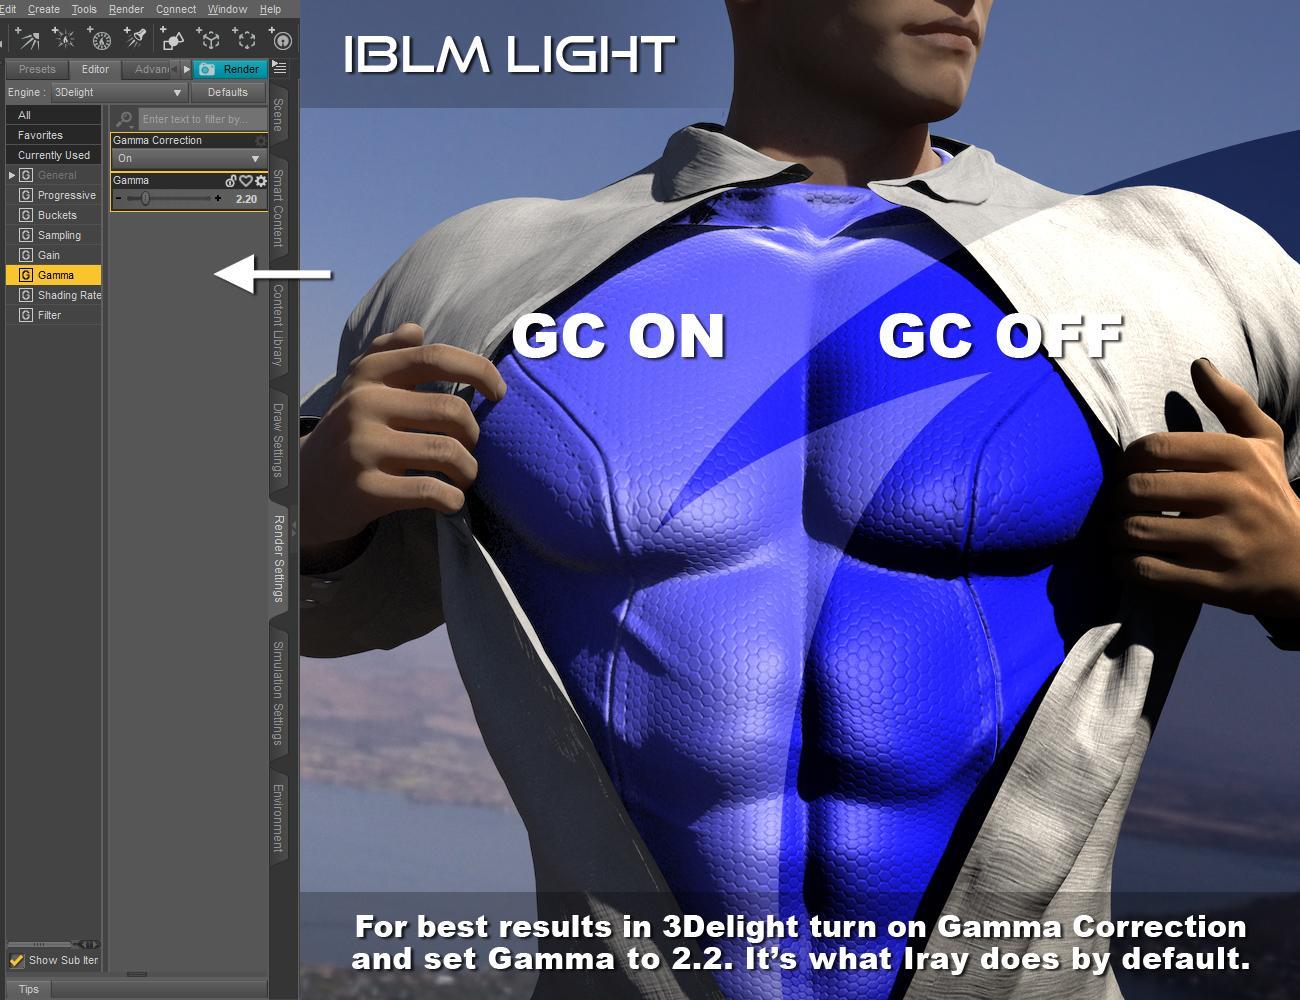 IBL Master: 3Delight render split - Gamma Correction vs No Gamma Correction